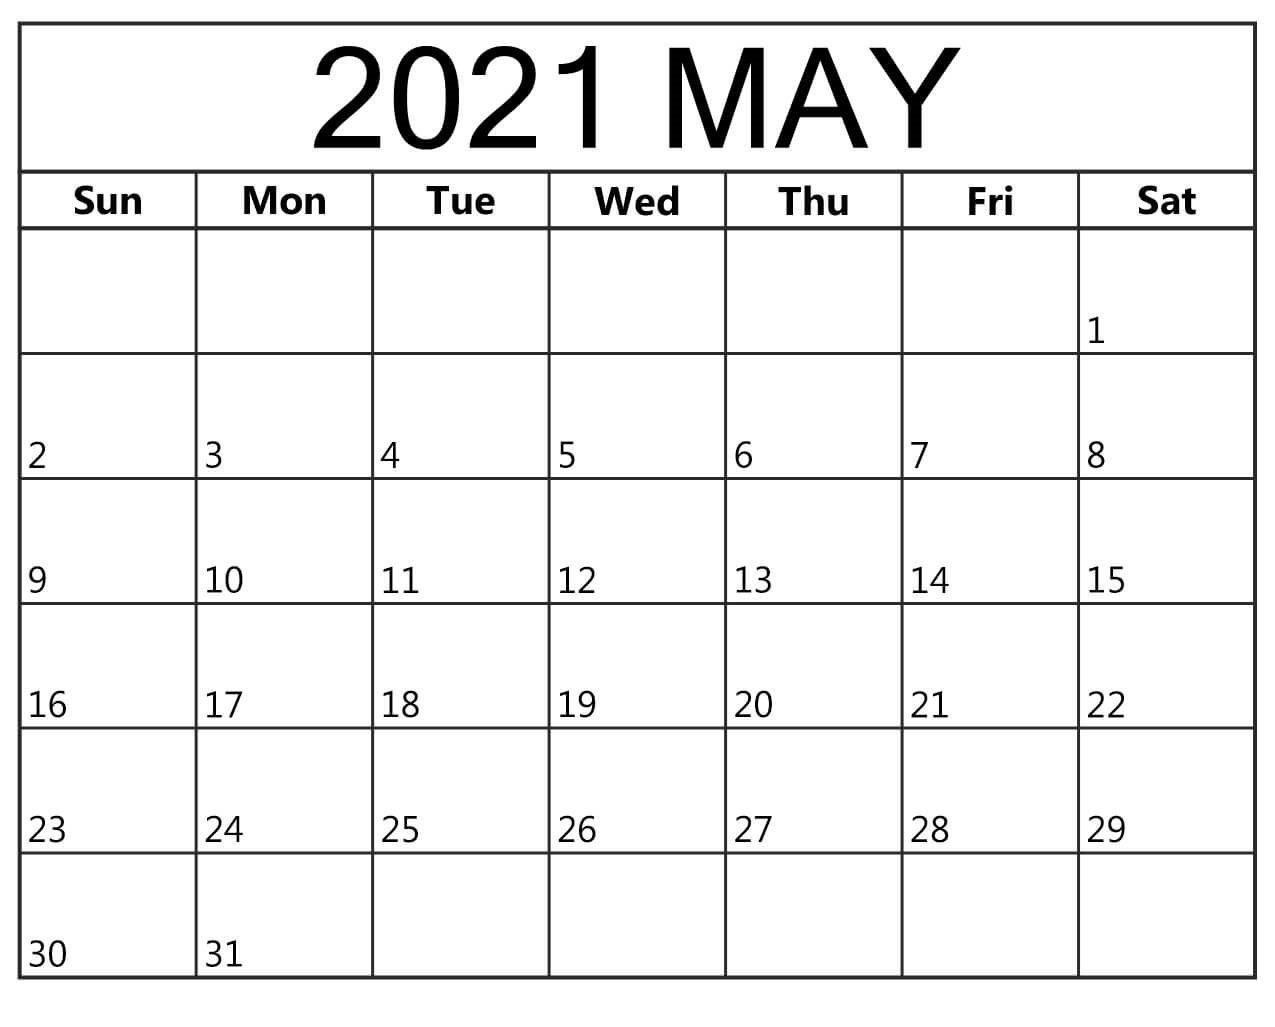 May 2021 Calendar Printable With Pdf - Thecalendarpedia regarding Free Printable Planner Pdf 2021